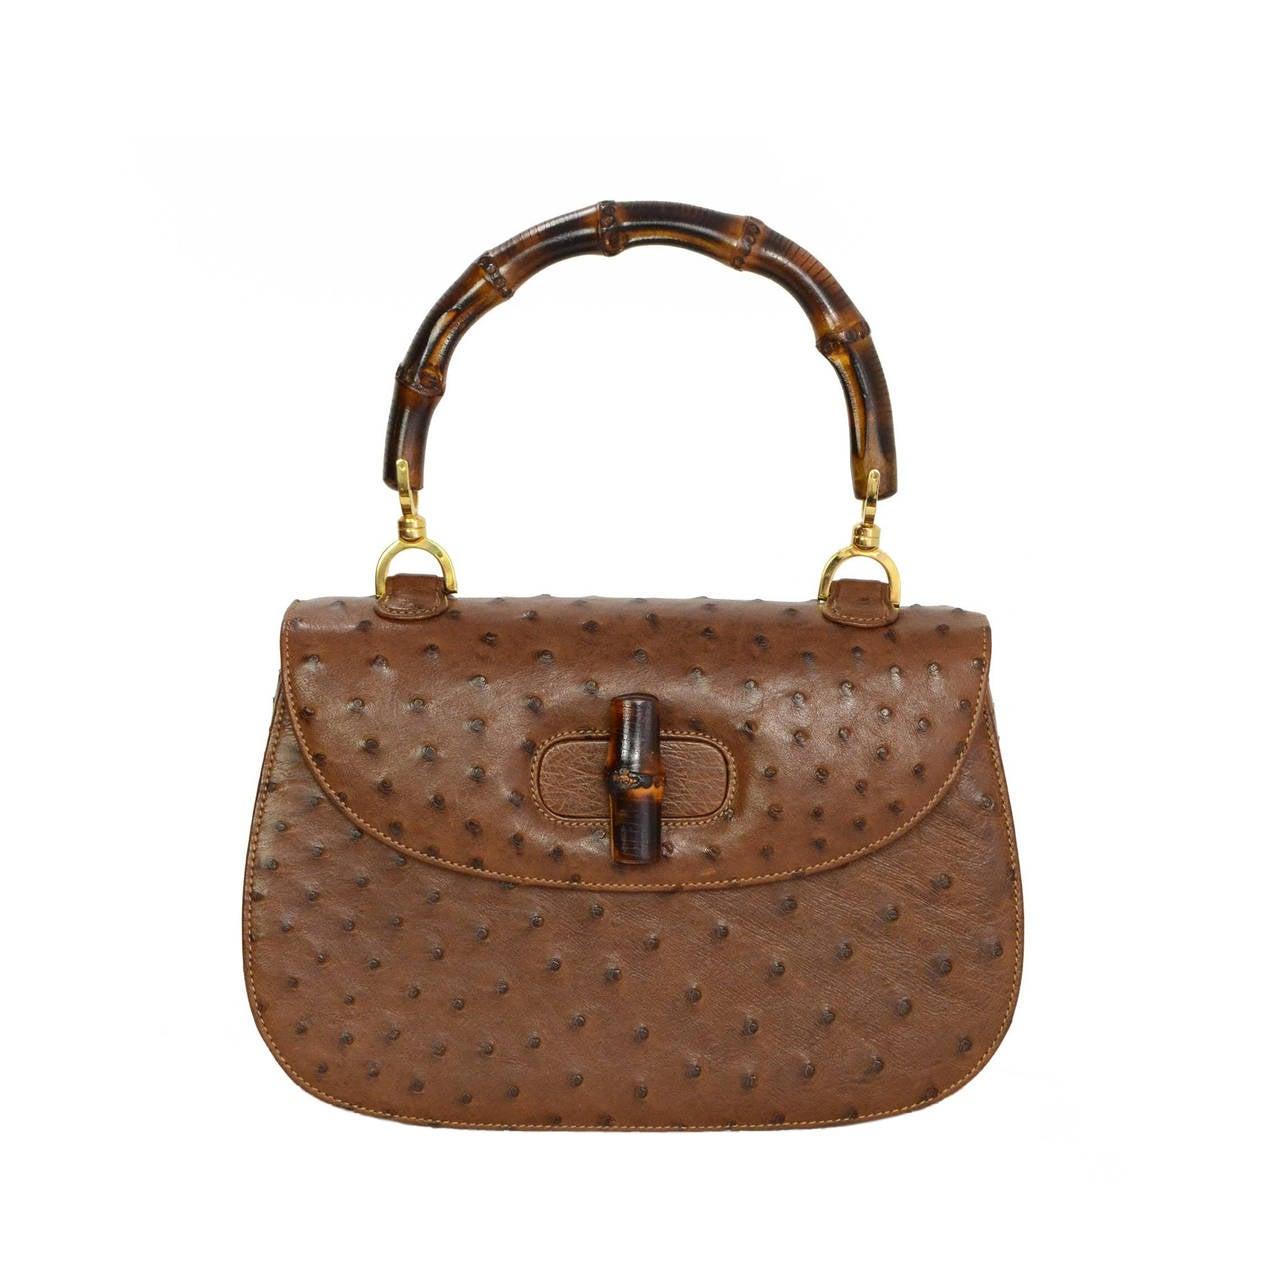 08b0c53448 GUCCI Vintage  70s- 80s Brown Ostrich Vintage Evening Bag GHW at 1stdibs